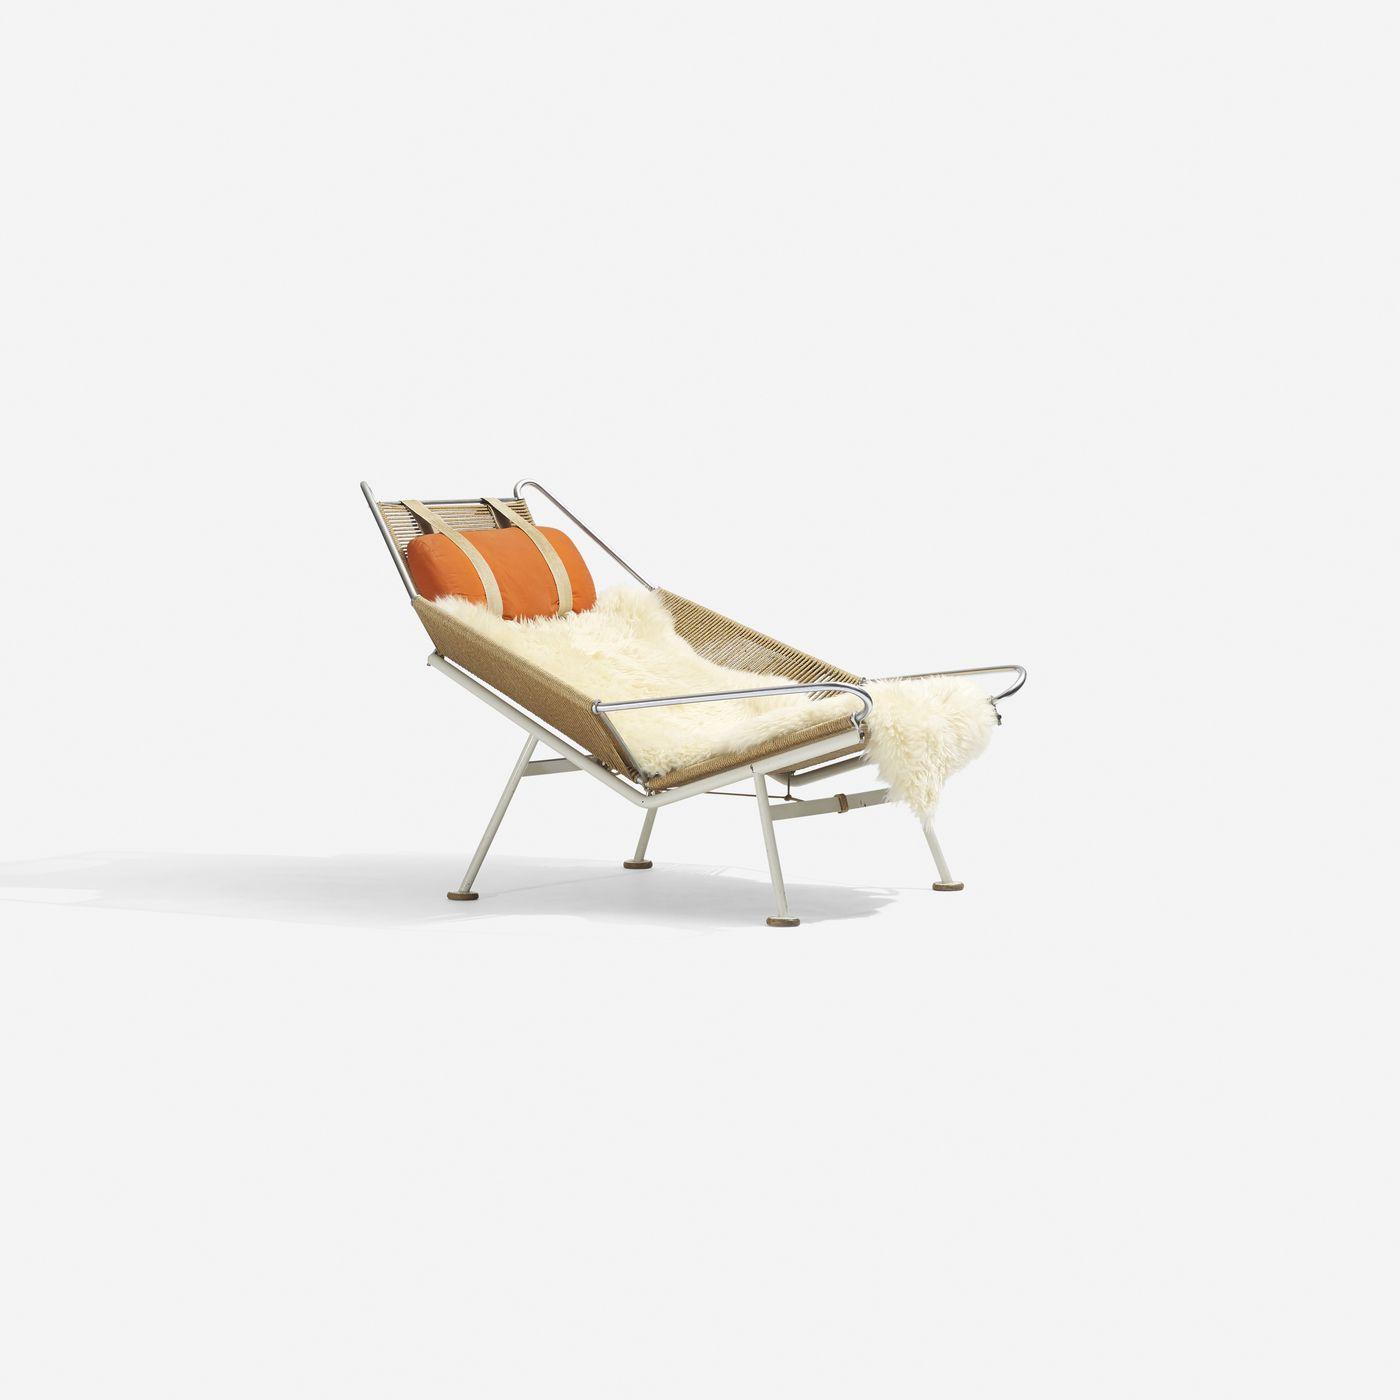 182: Hans Wegner / Flag Halyard lounge chair < Scandinavian Design, 8 May 2014 < Auctions   Wright